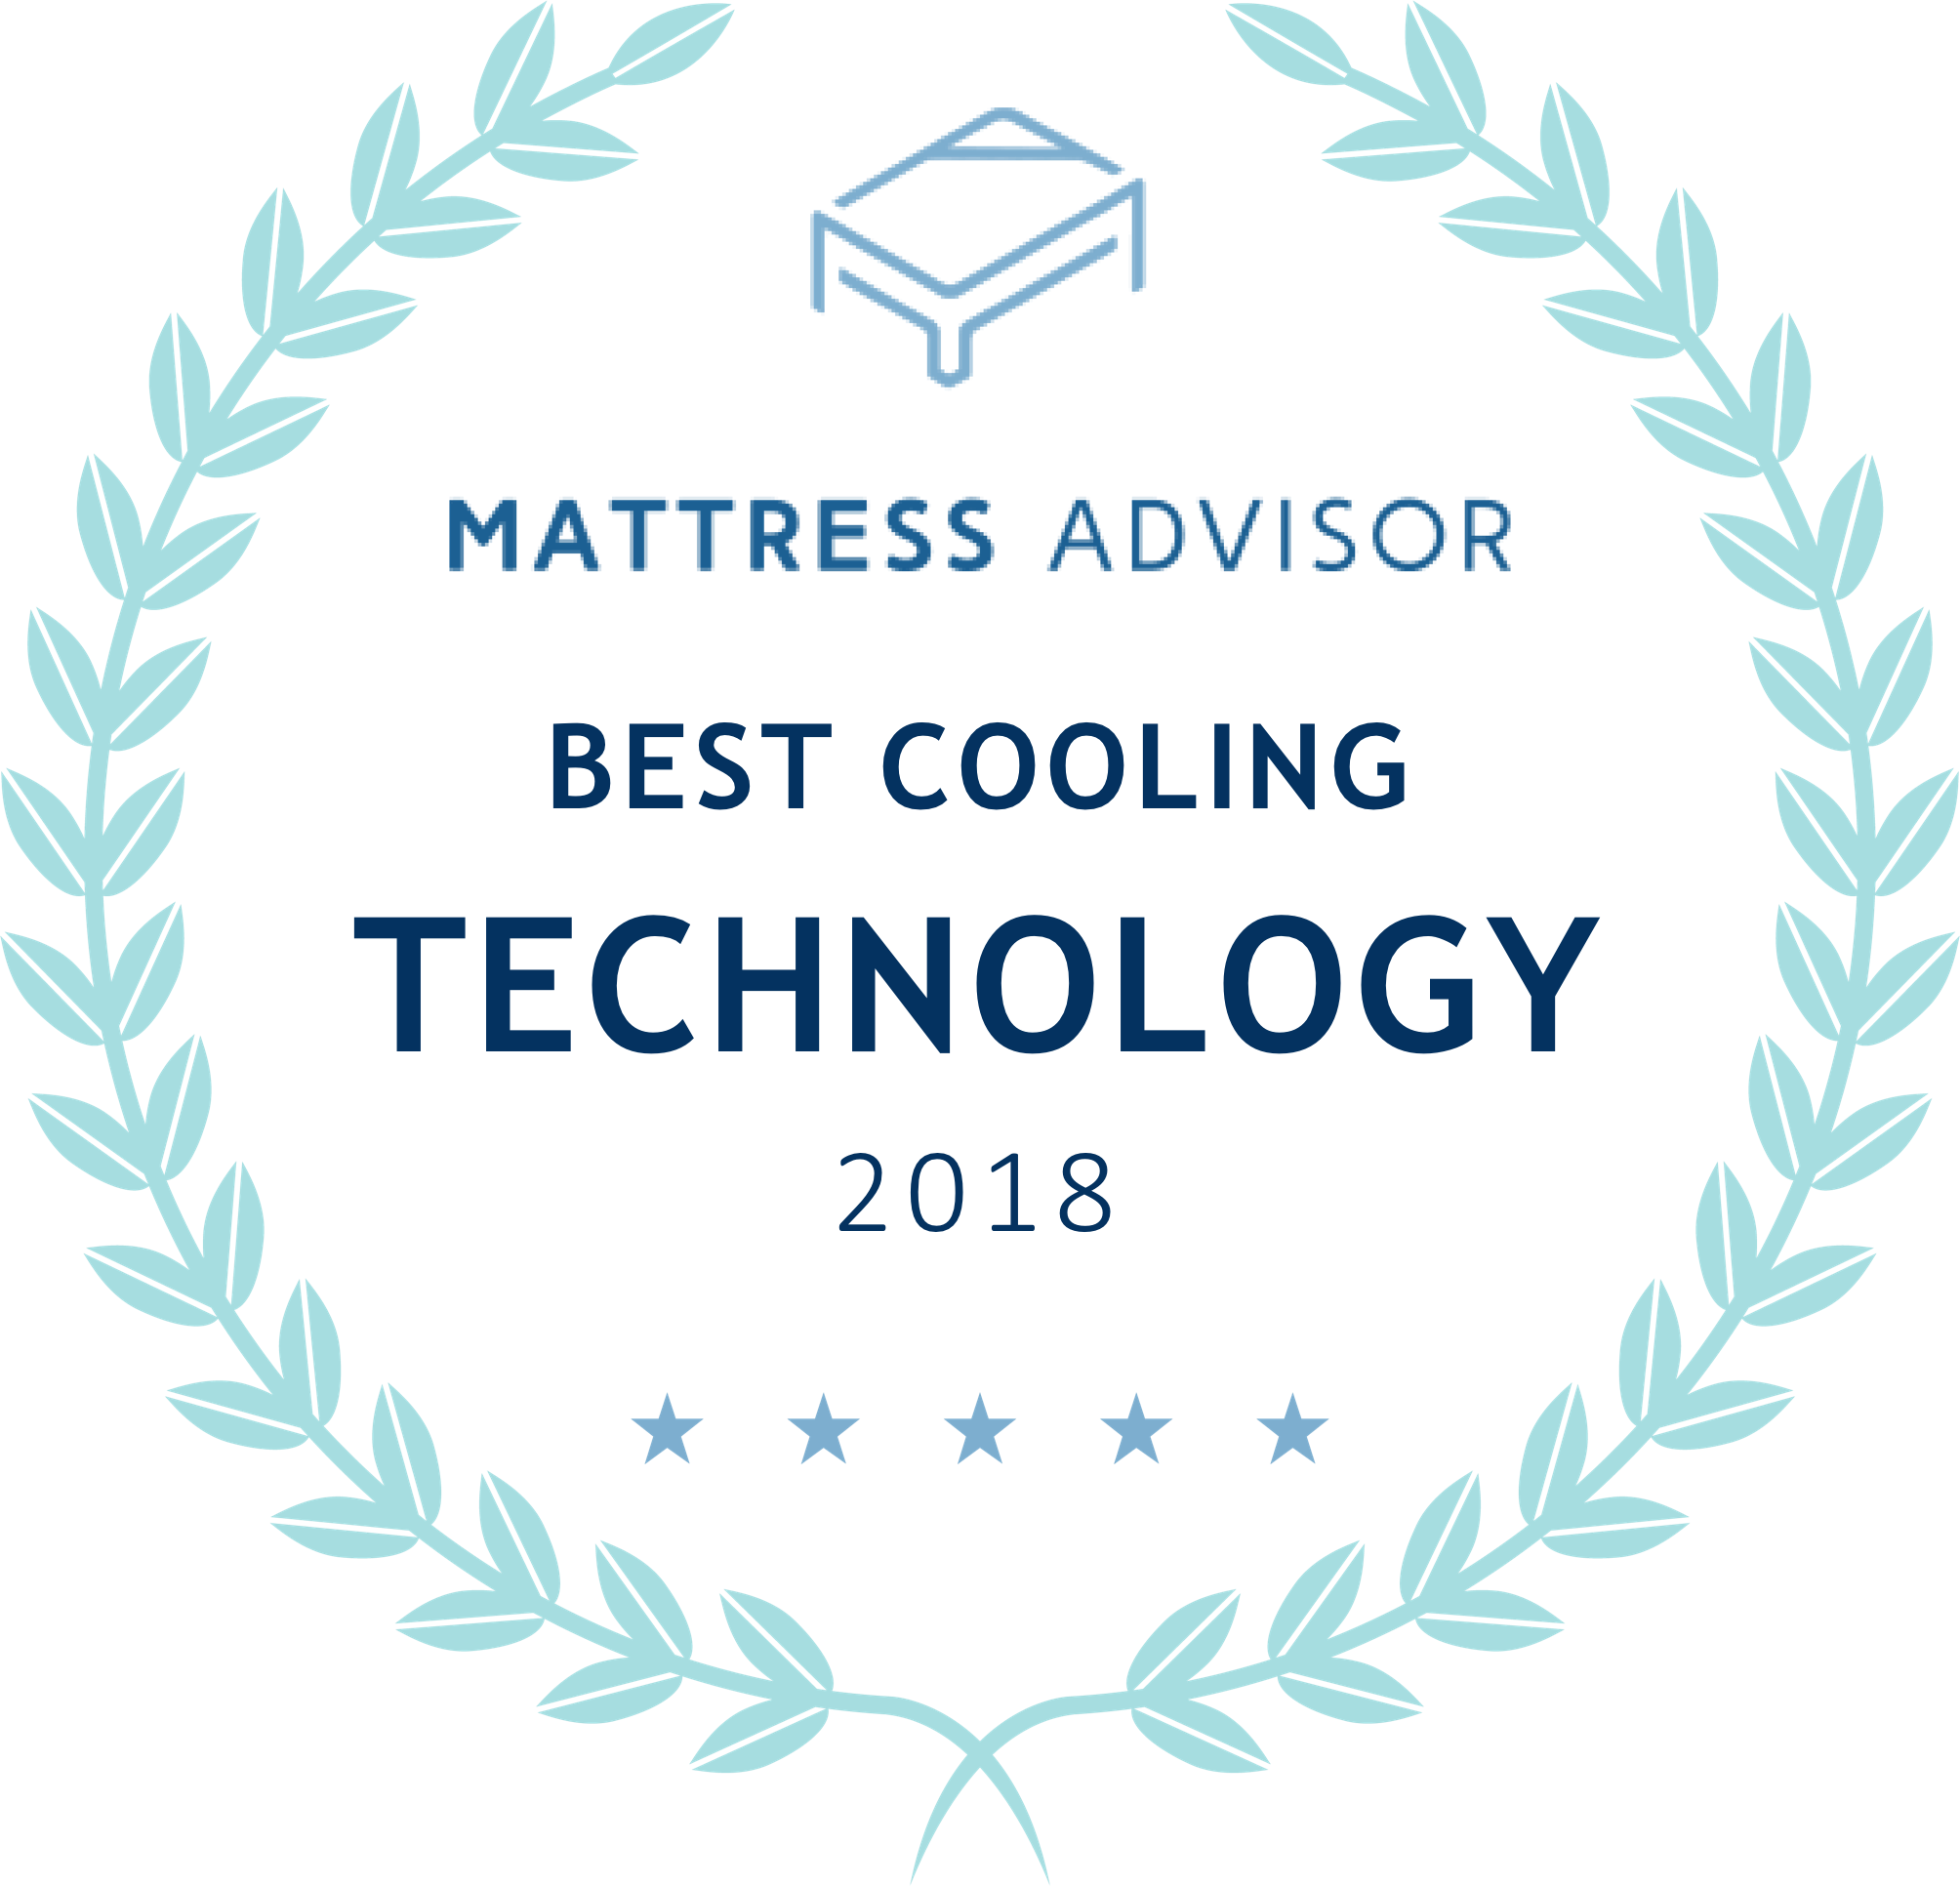 Best Cooling Technology award 2018